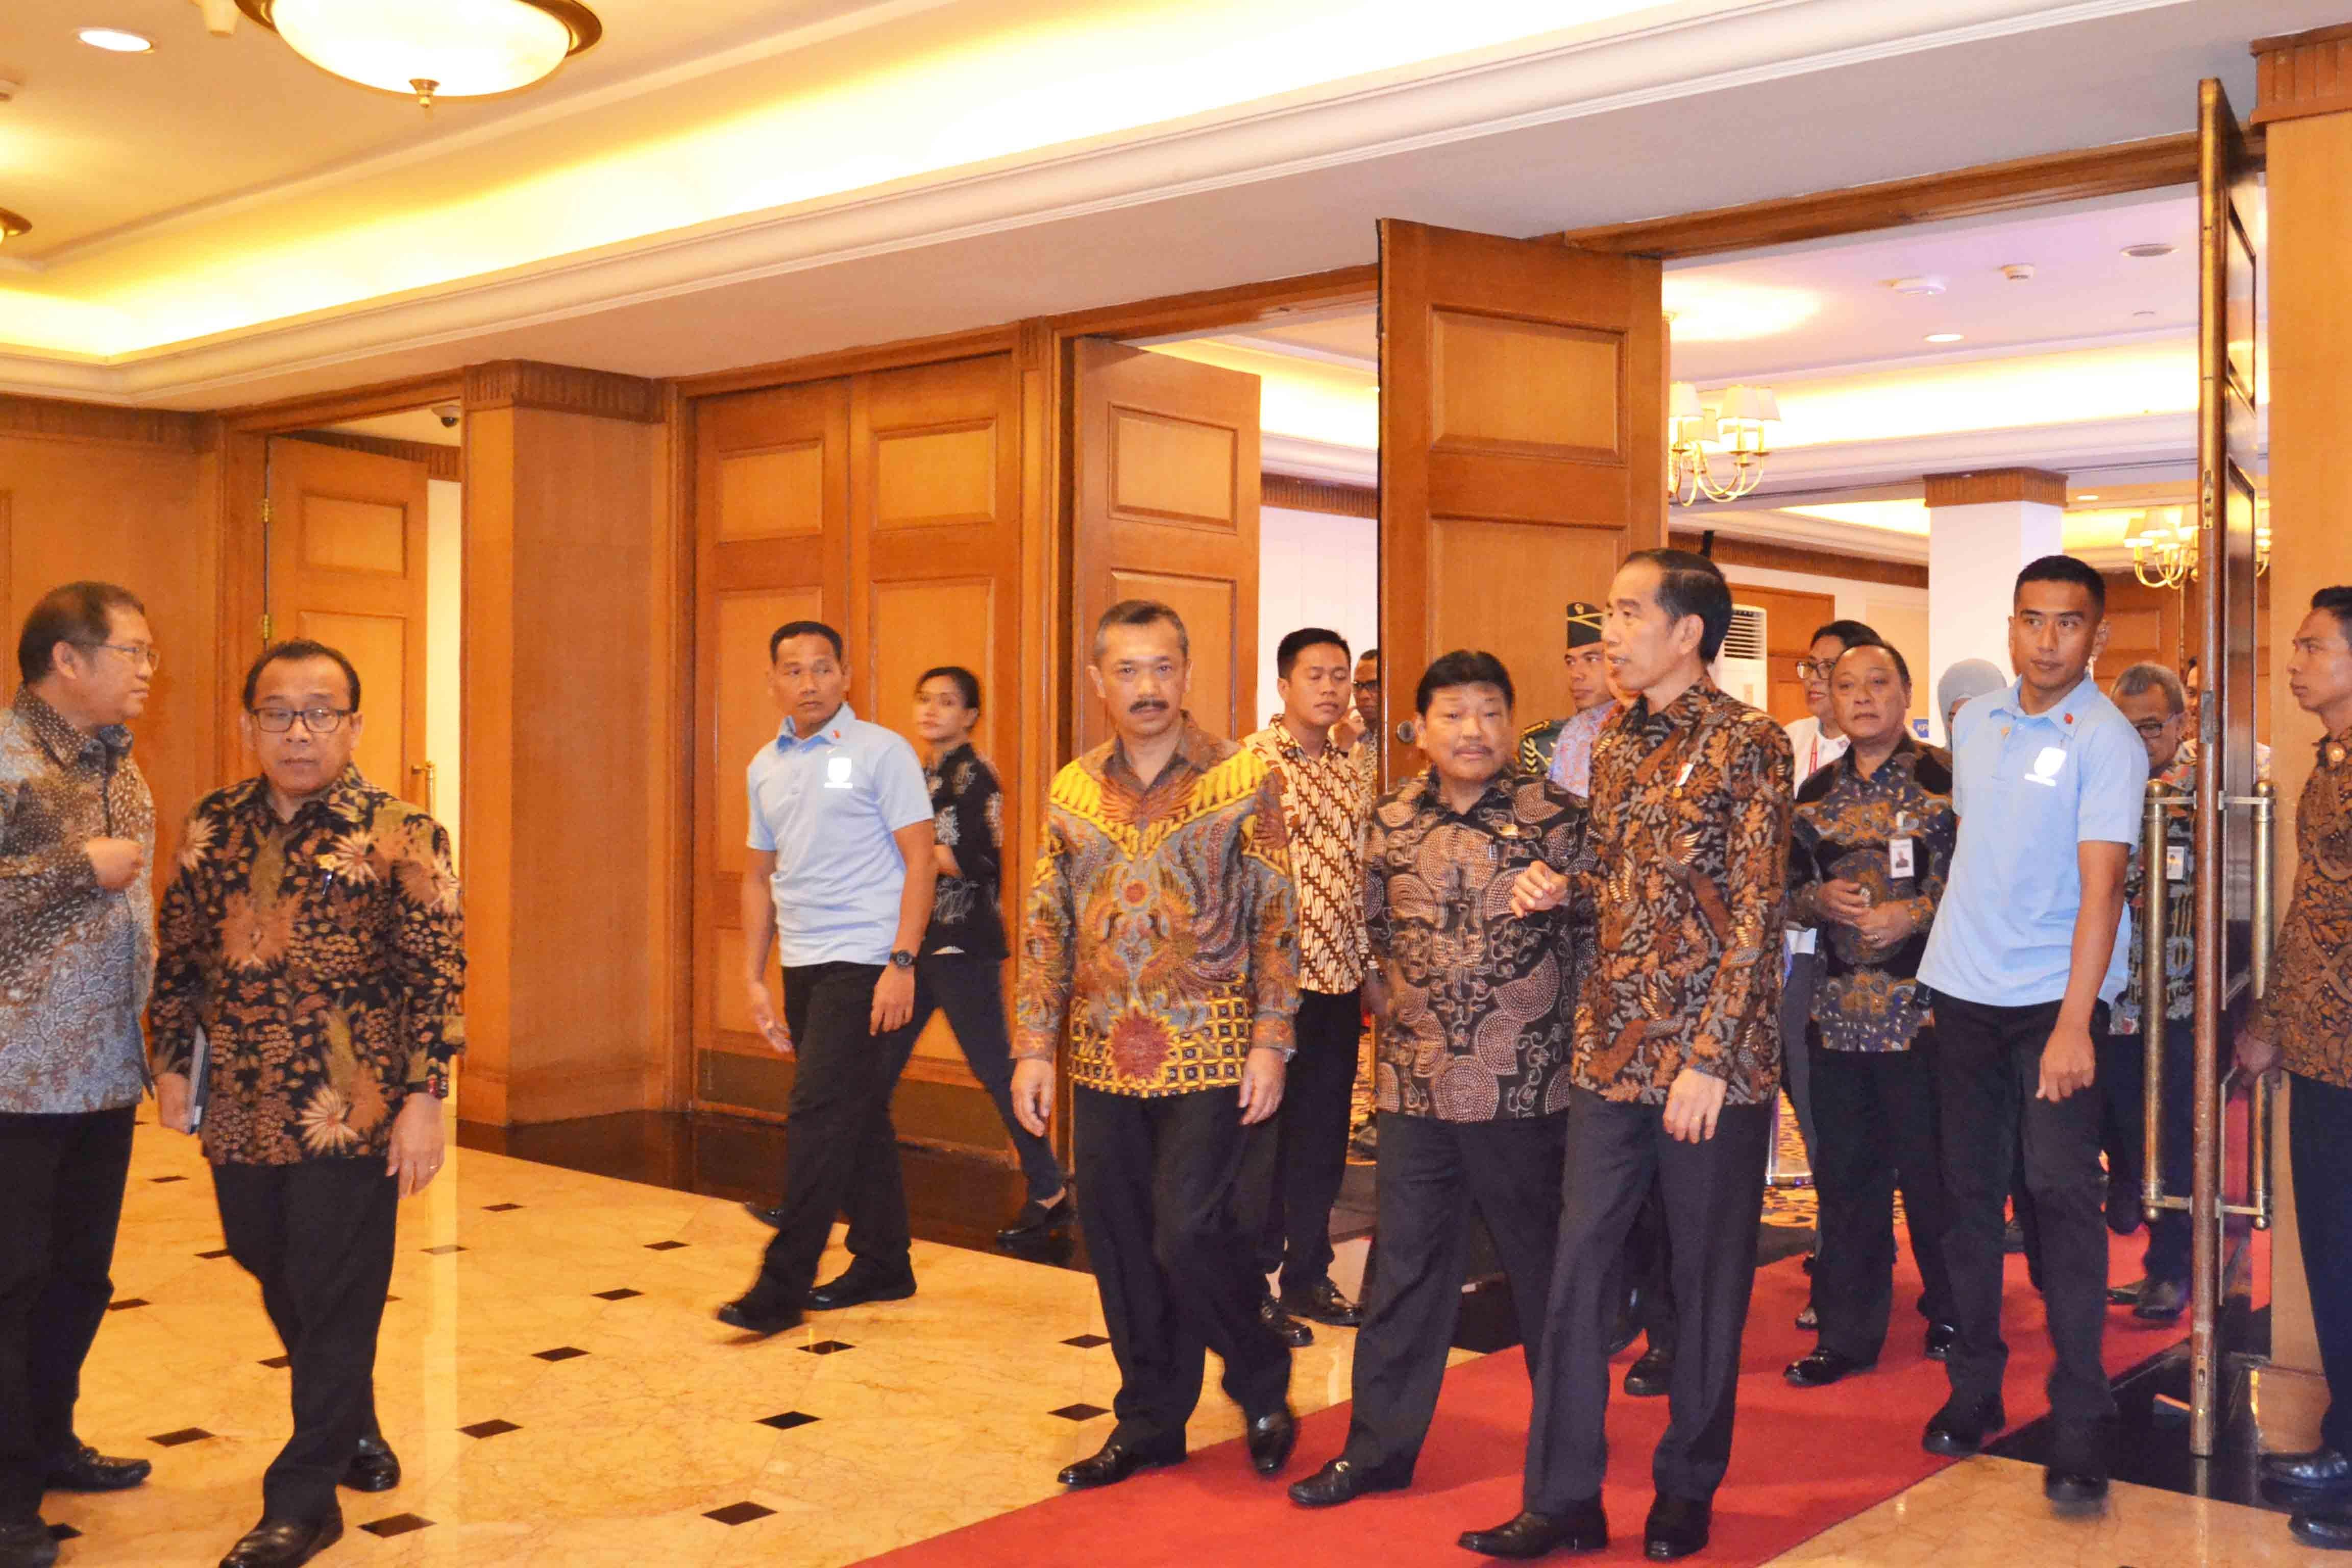 Gelar Buah Nusantara , Di Aryaduta 2018